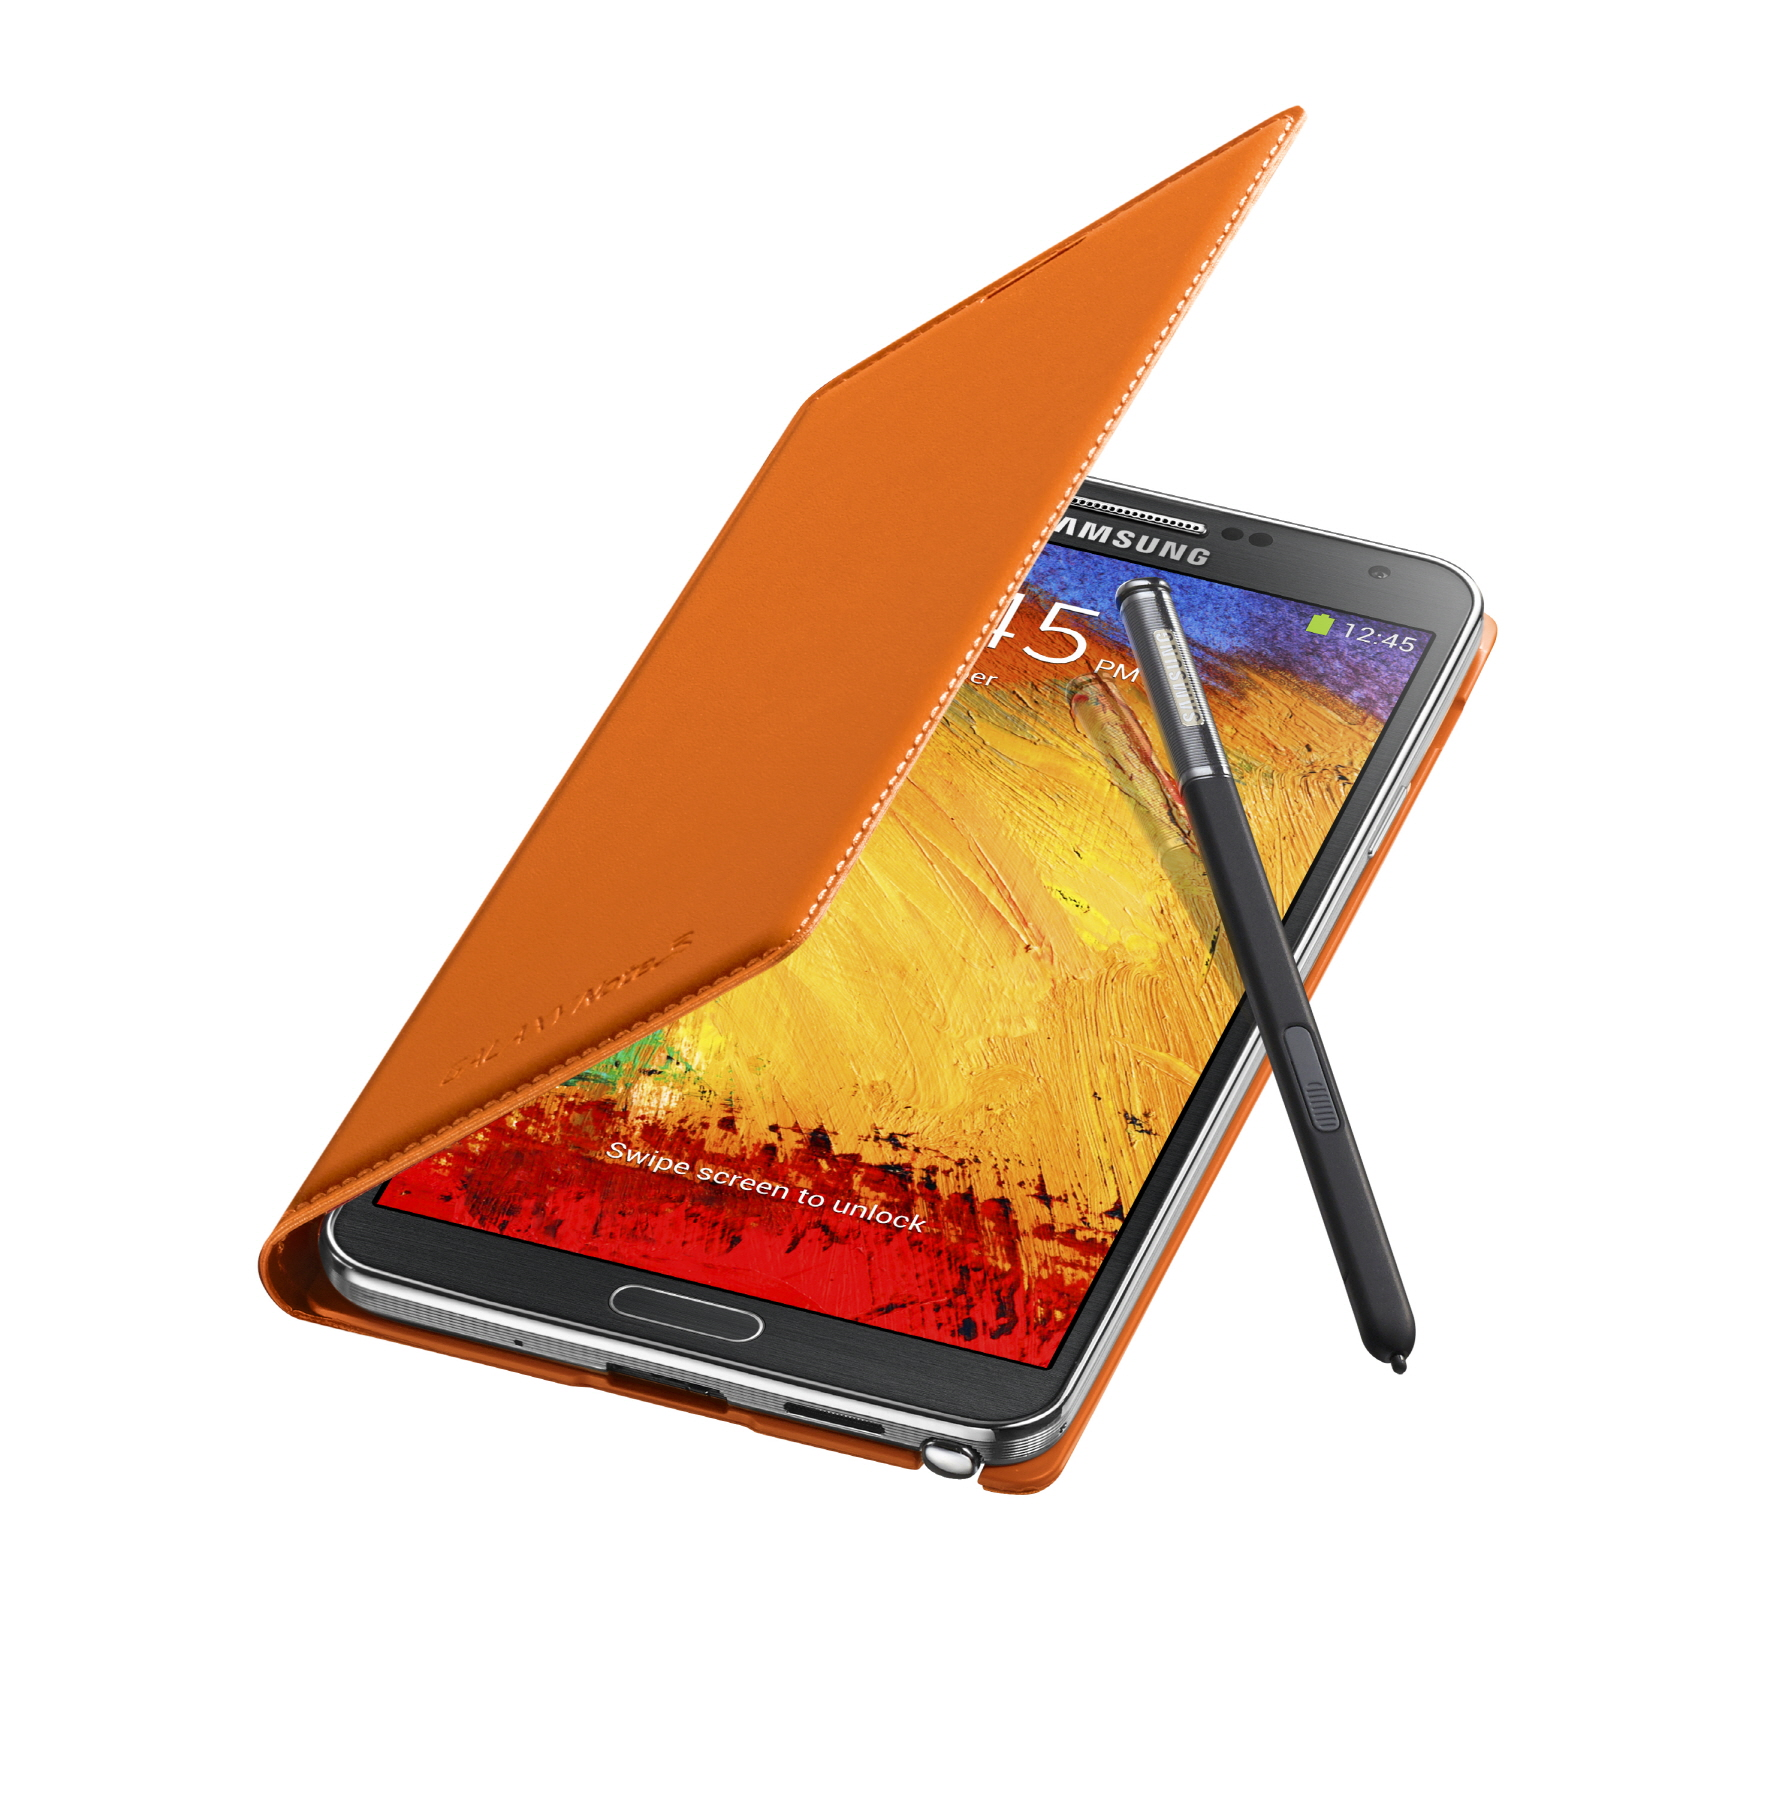 Galaxy Note3 FlipCover 004 Open Pen Wild Orange